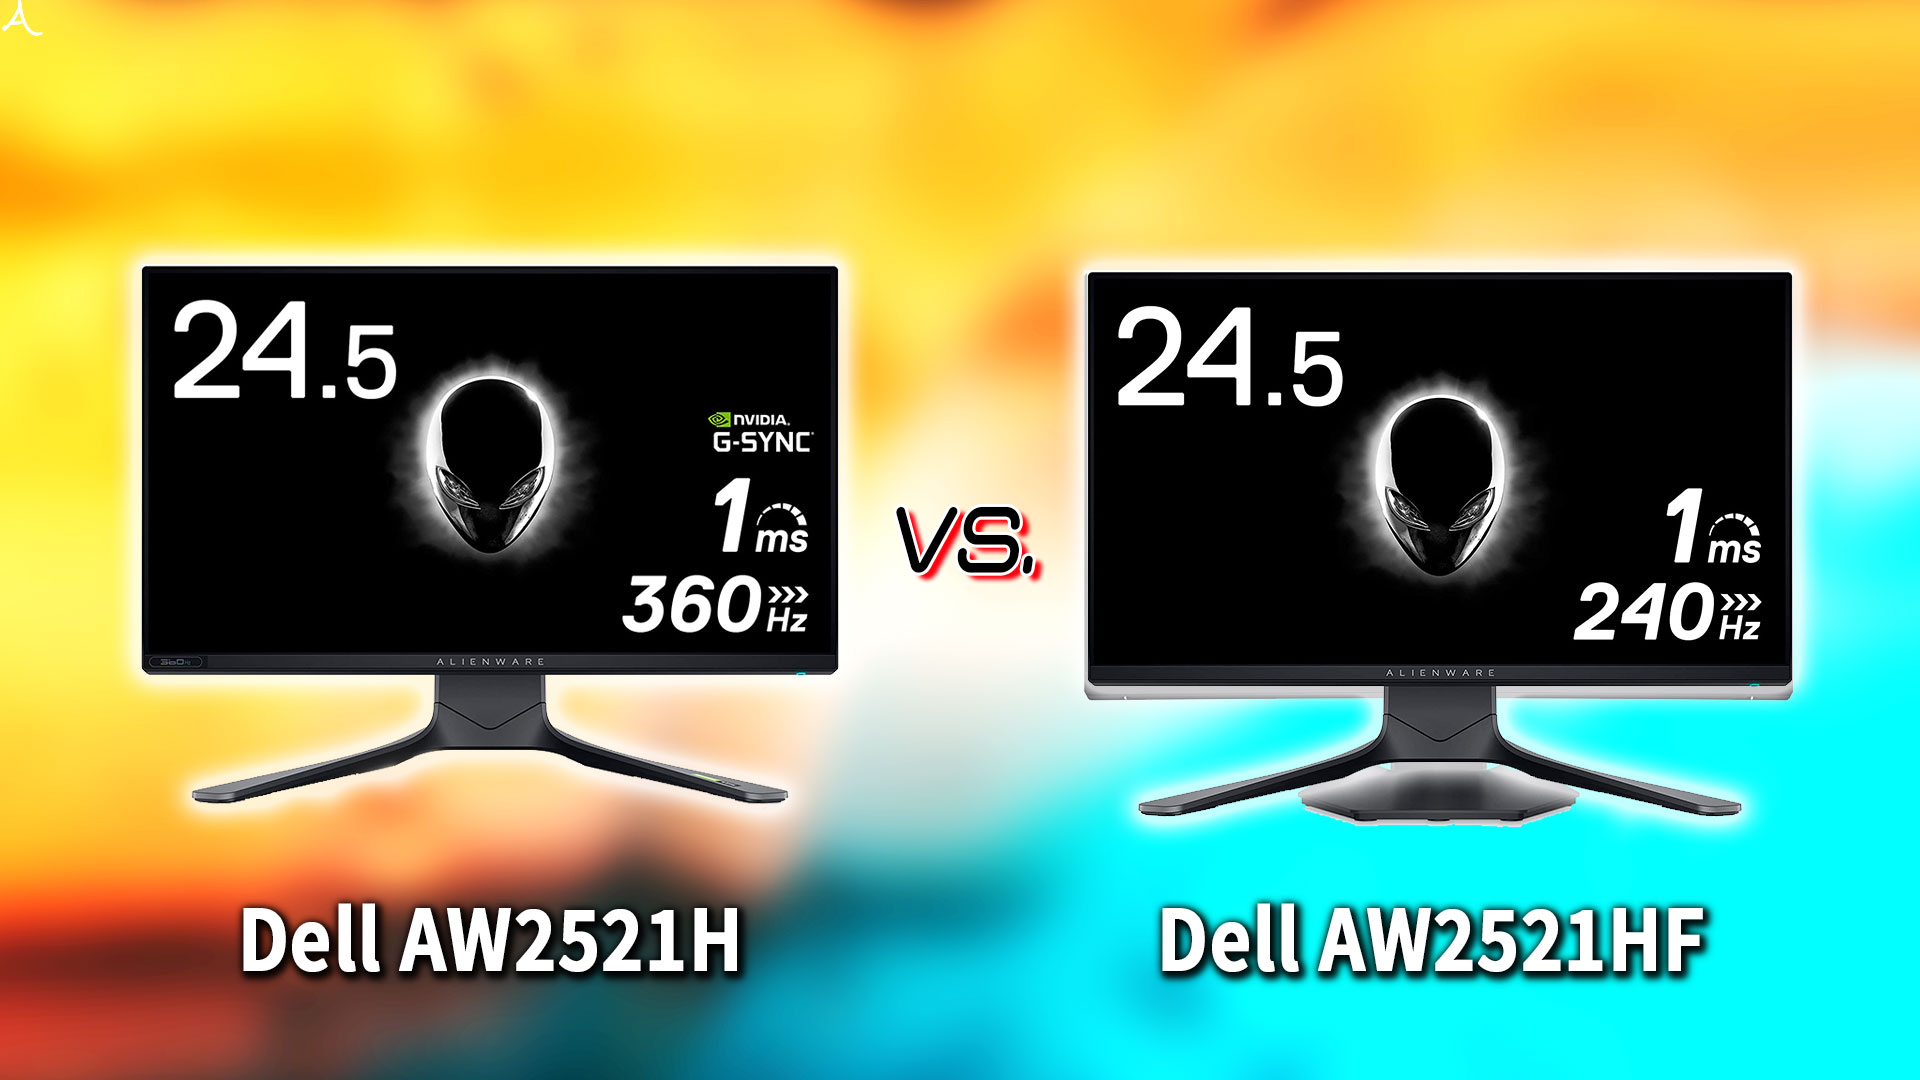 「Dell ALIENWARE AW2521H」と「AW2521HF」の違いを比較:どっちを買う?